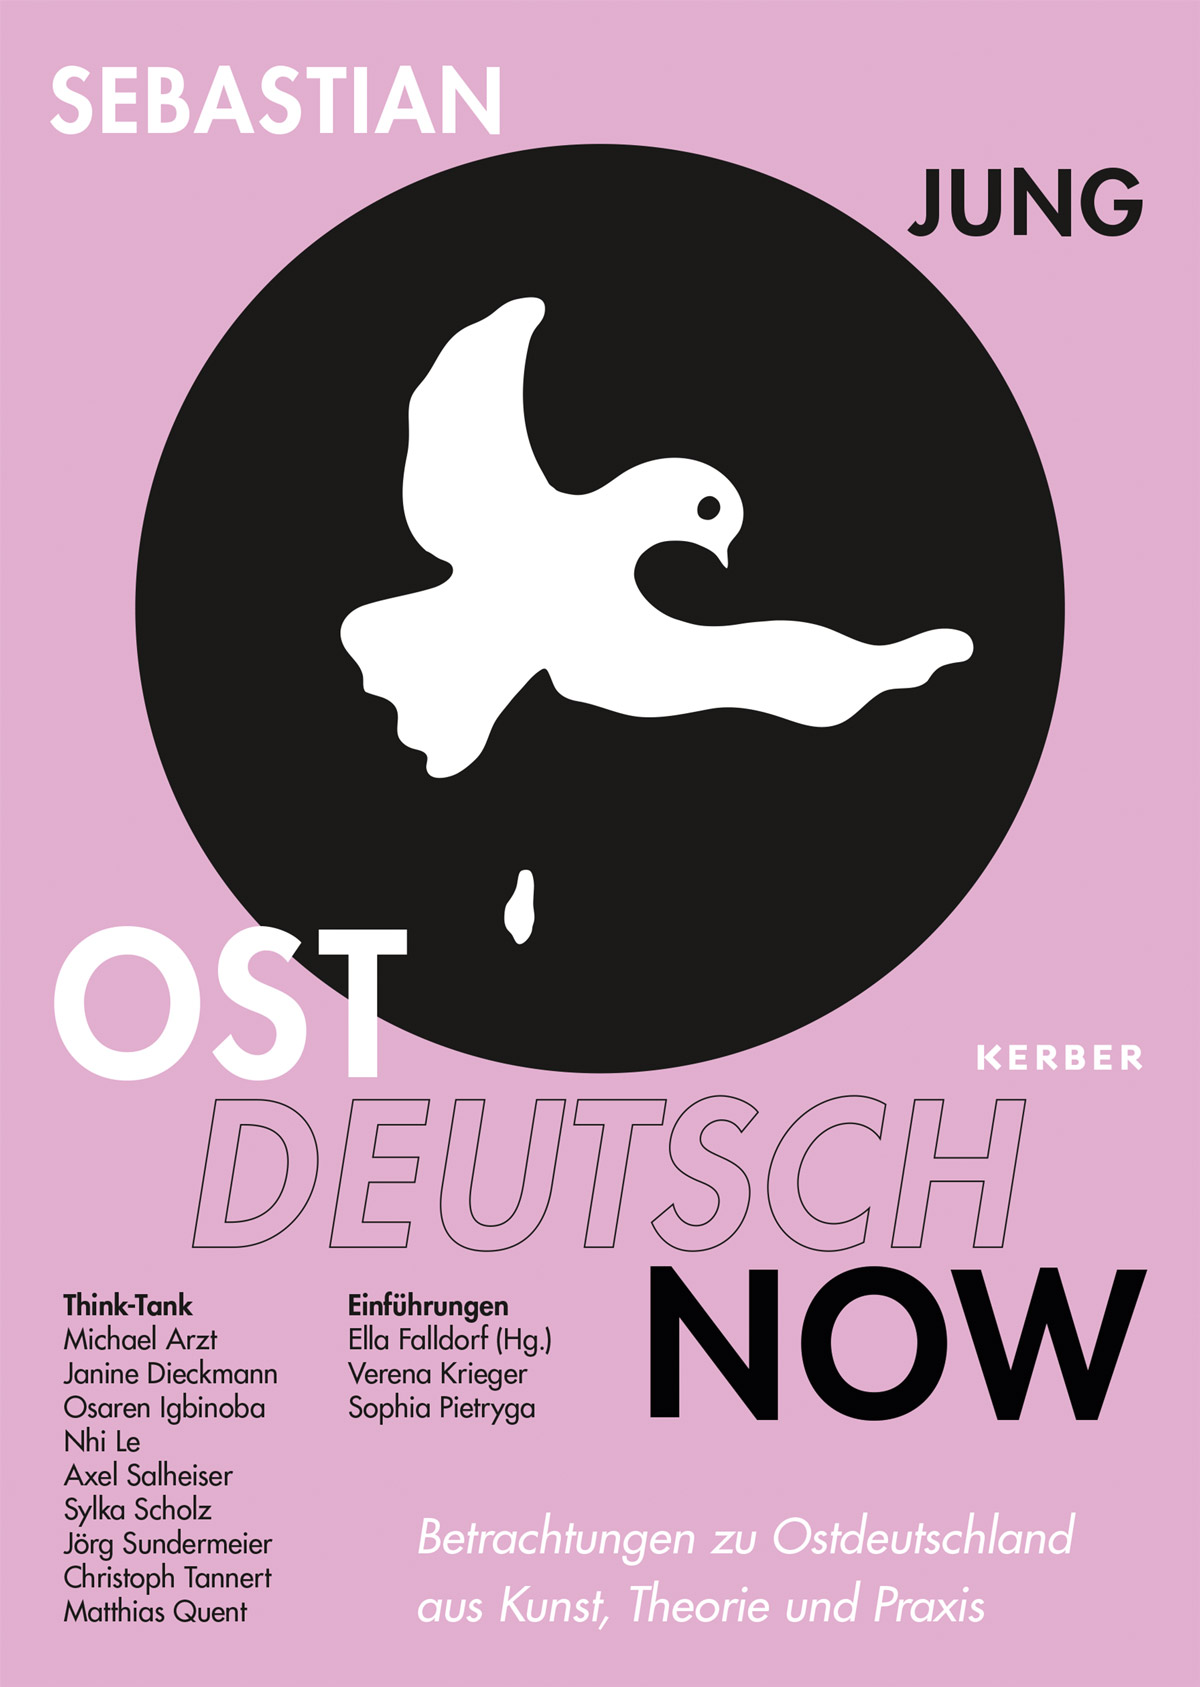 slanted-book-OstDeutschNow_19